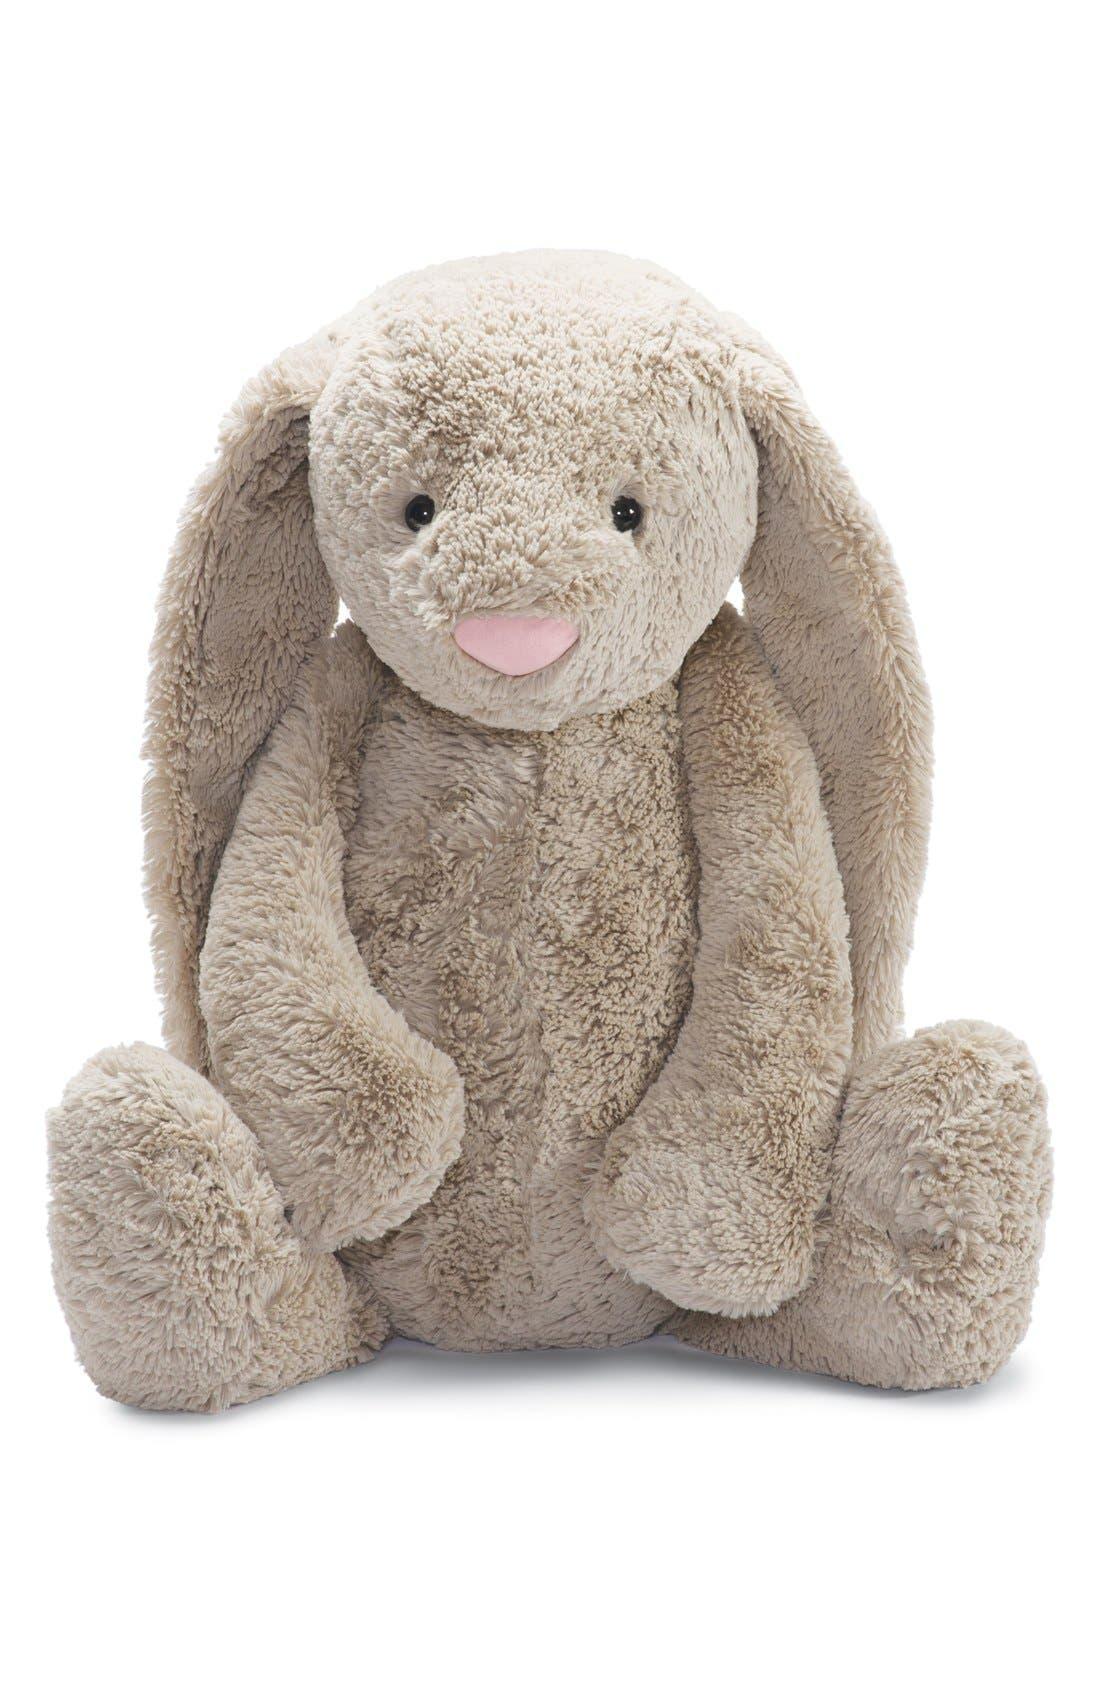 'Large Bashful Bunny' Stuffed Animal,                             Main thumbnail 1, color,                             250